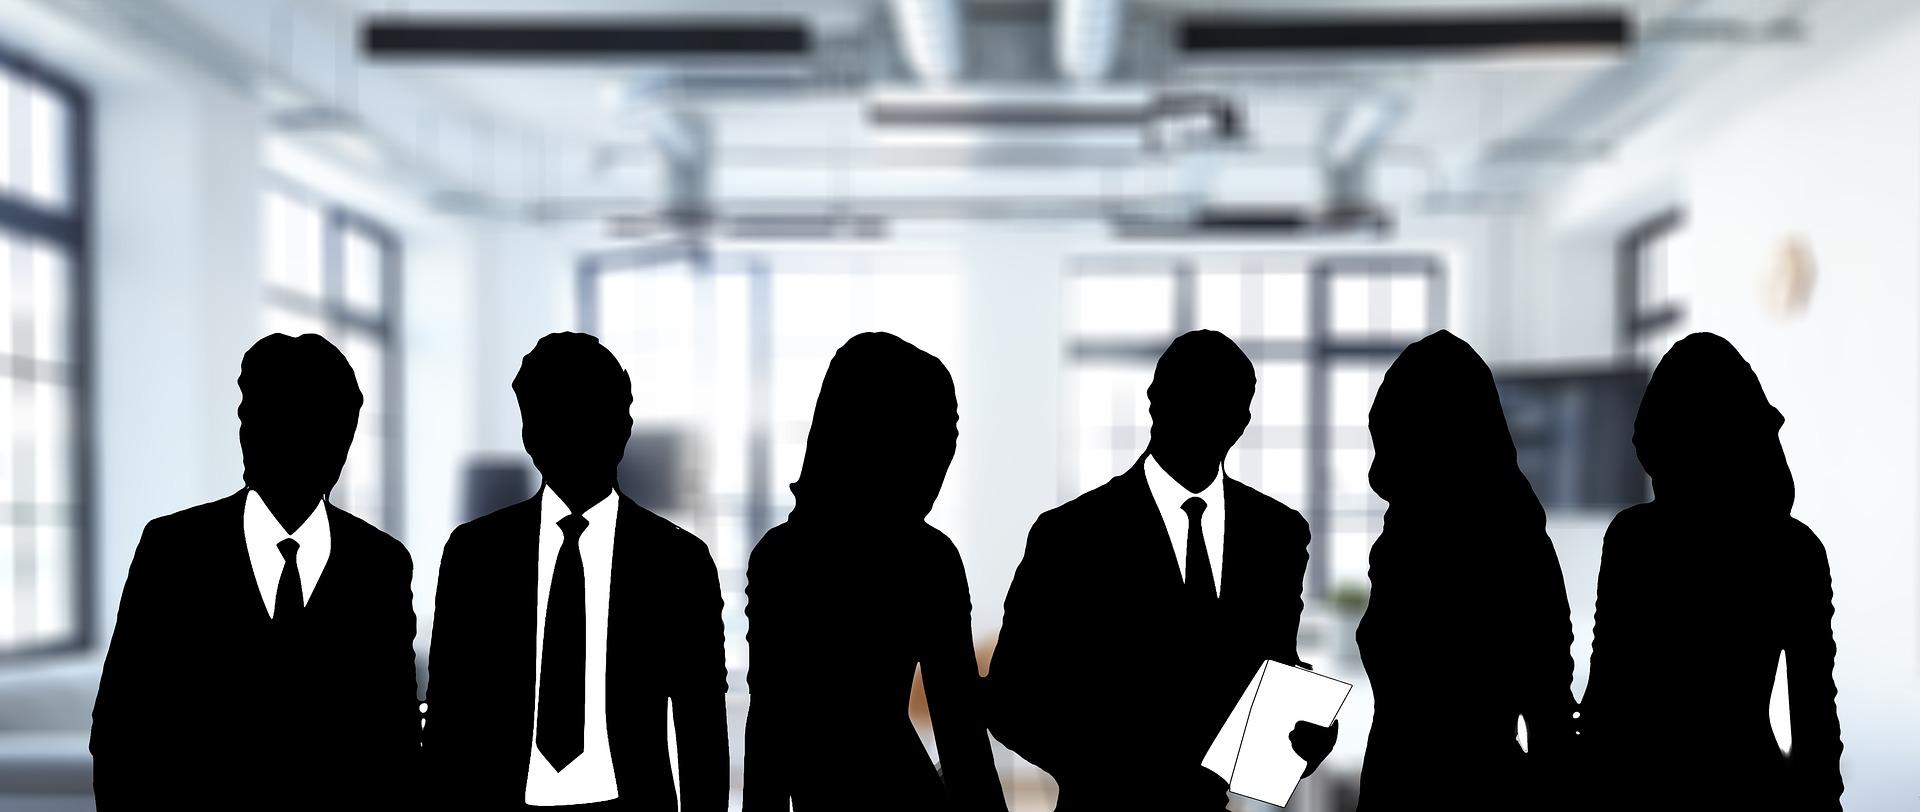 A Key for Customer Relationship Management is Total Communication Management